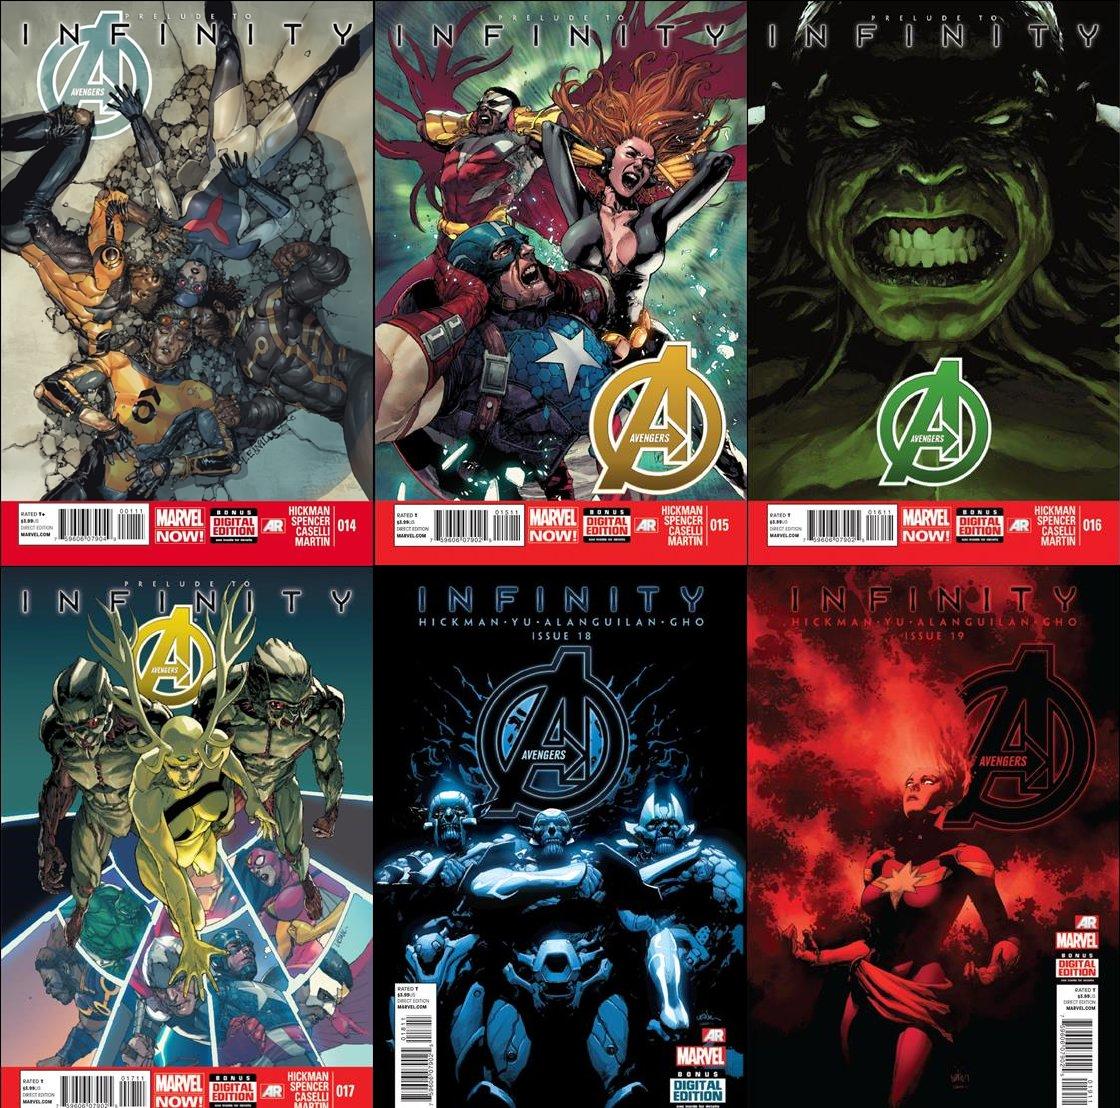 Avengers #14 15 16 17 18 19 20 21 22 23 Trade Set Infinity Storyline [2013] VF/NM Marvel Comics